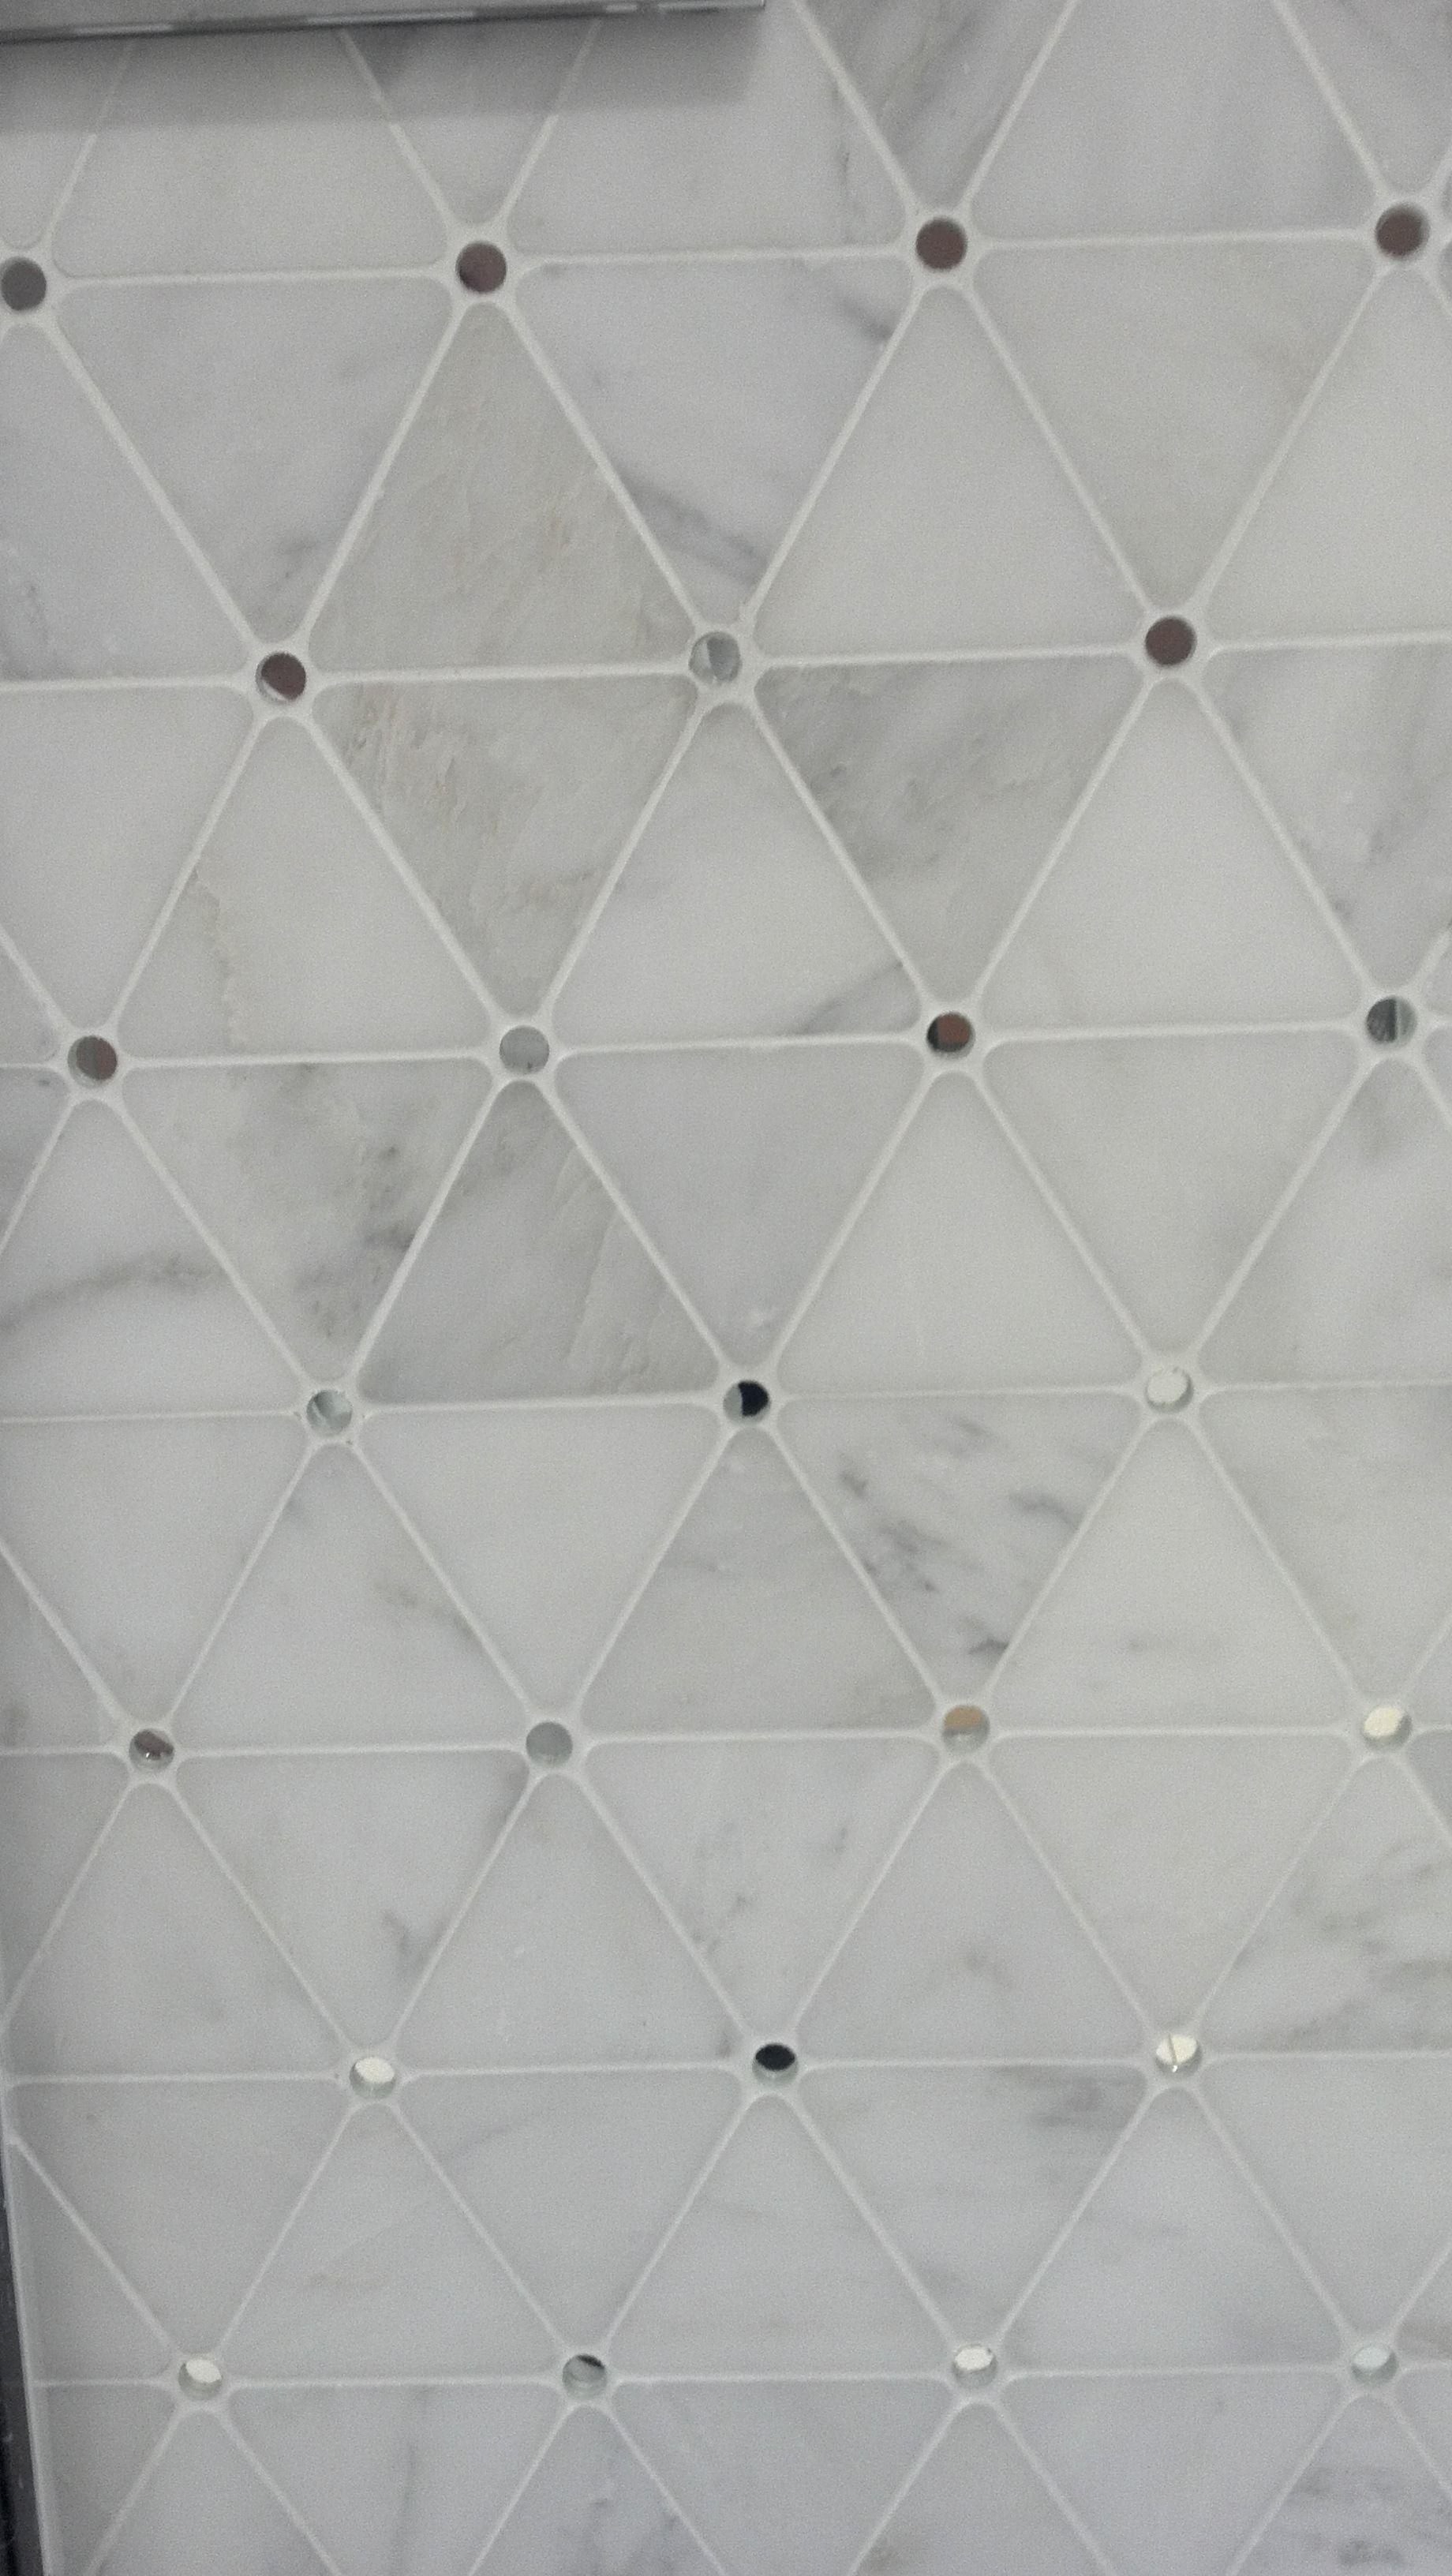 Mosaic liners art pattern mirrorred bathroom wall discount tiles - Porcelanosa Diamond Blanco Marmara Mirror Mirror Backsplashmosaic Backsplashmarble Mosaicwall Tilesdiamond Shapesbathroom